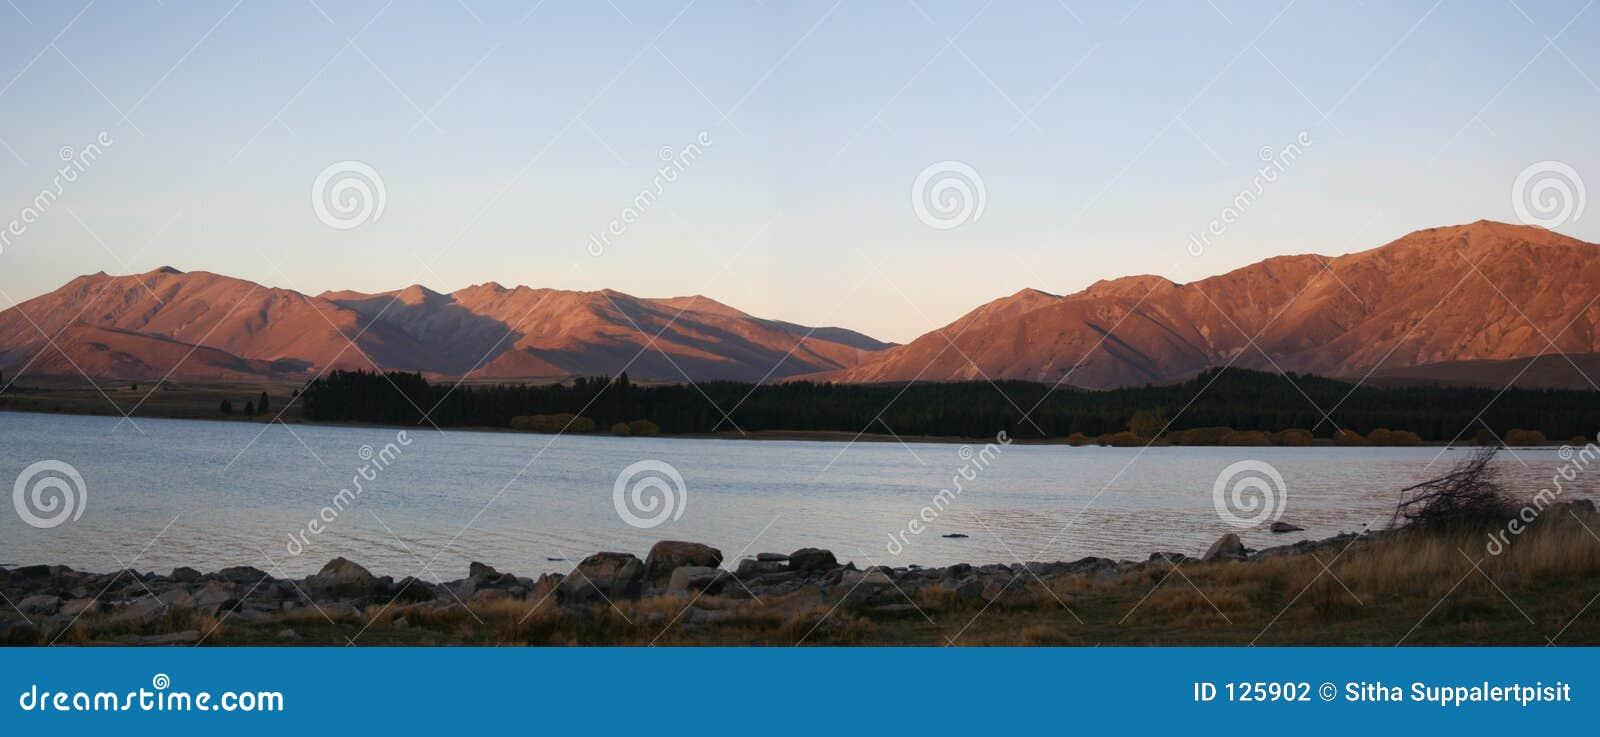 Panorama tekapo jezioro nowej Zelandii